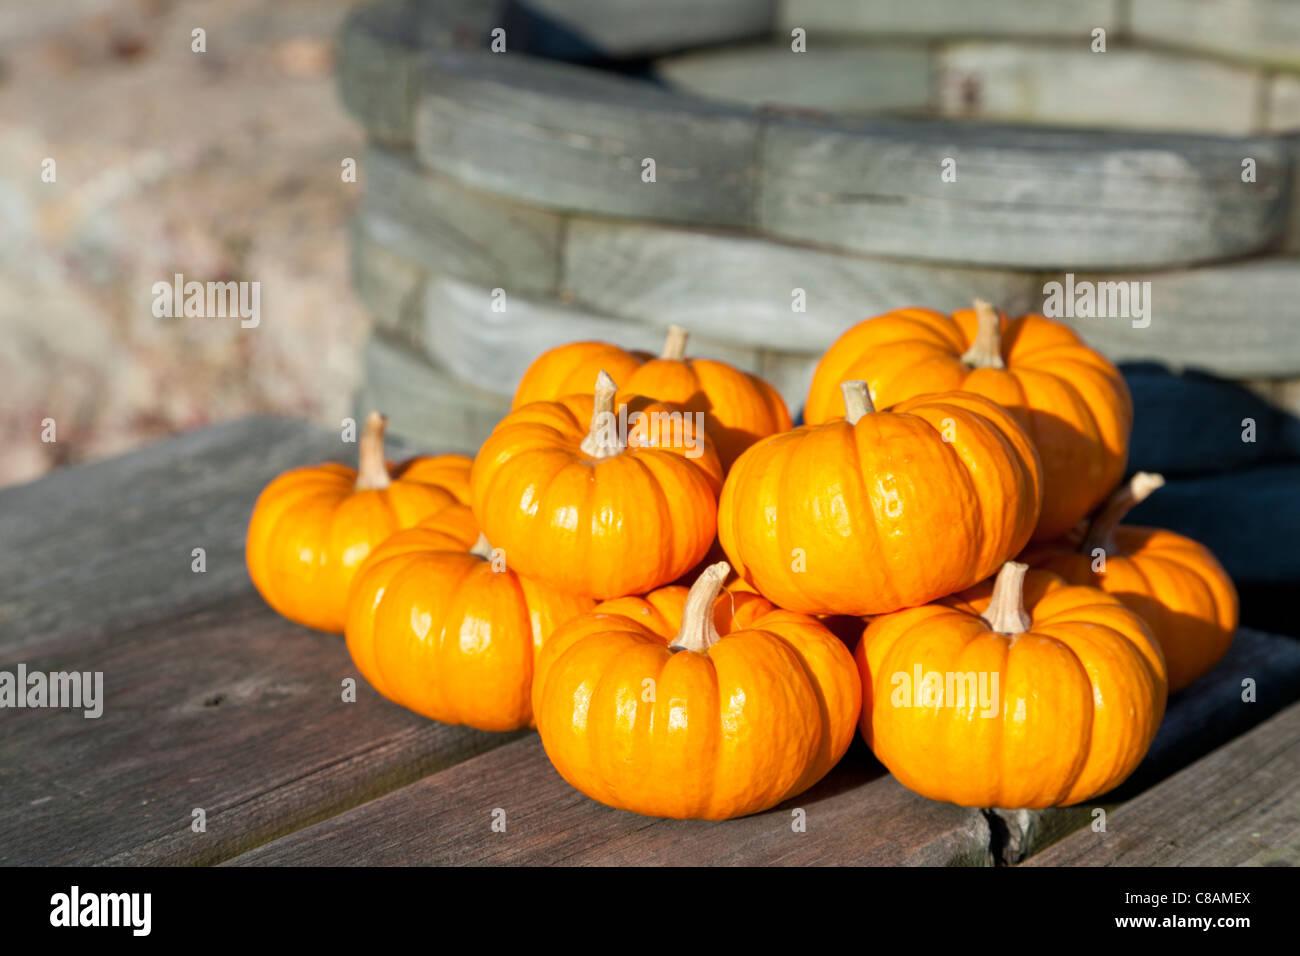 Miniature decorative pumpkins - Stock Image